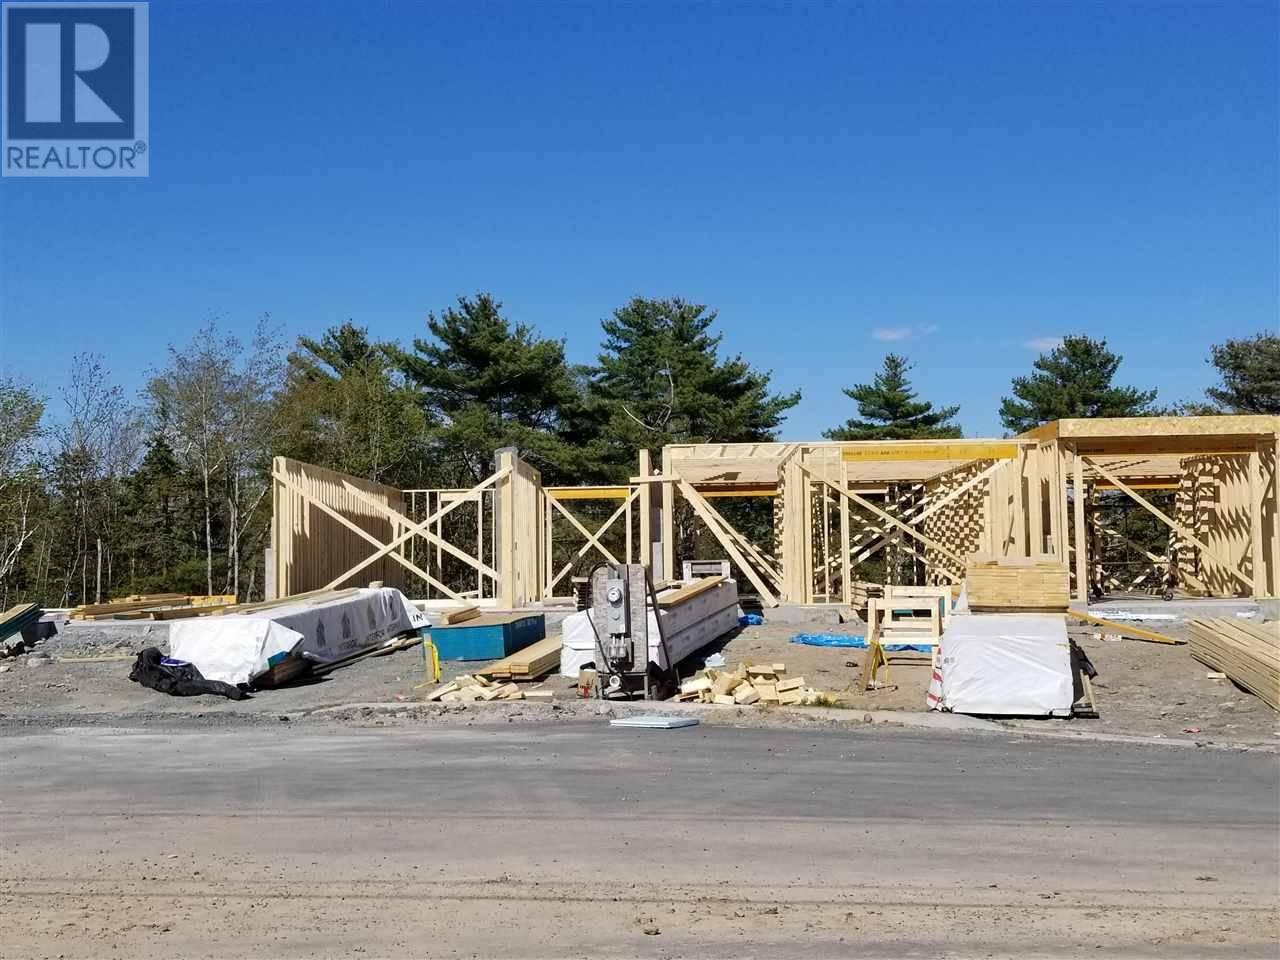 Townhouse for sale at 22 Alamir Ct Unit Al05b Halifax Nova Scotia - MLS: 201913584